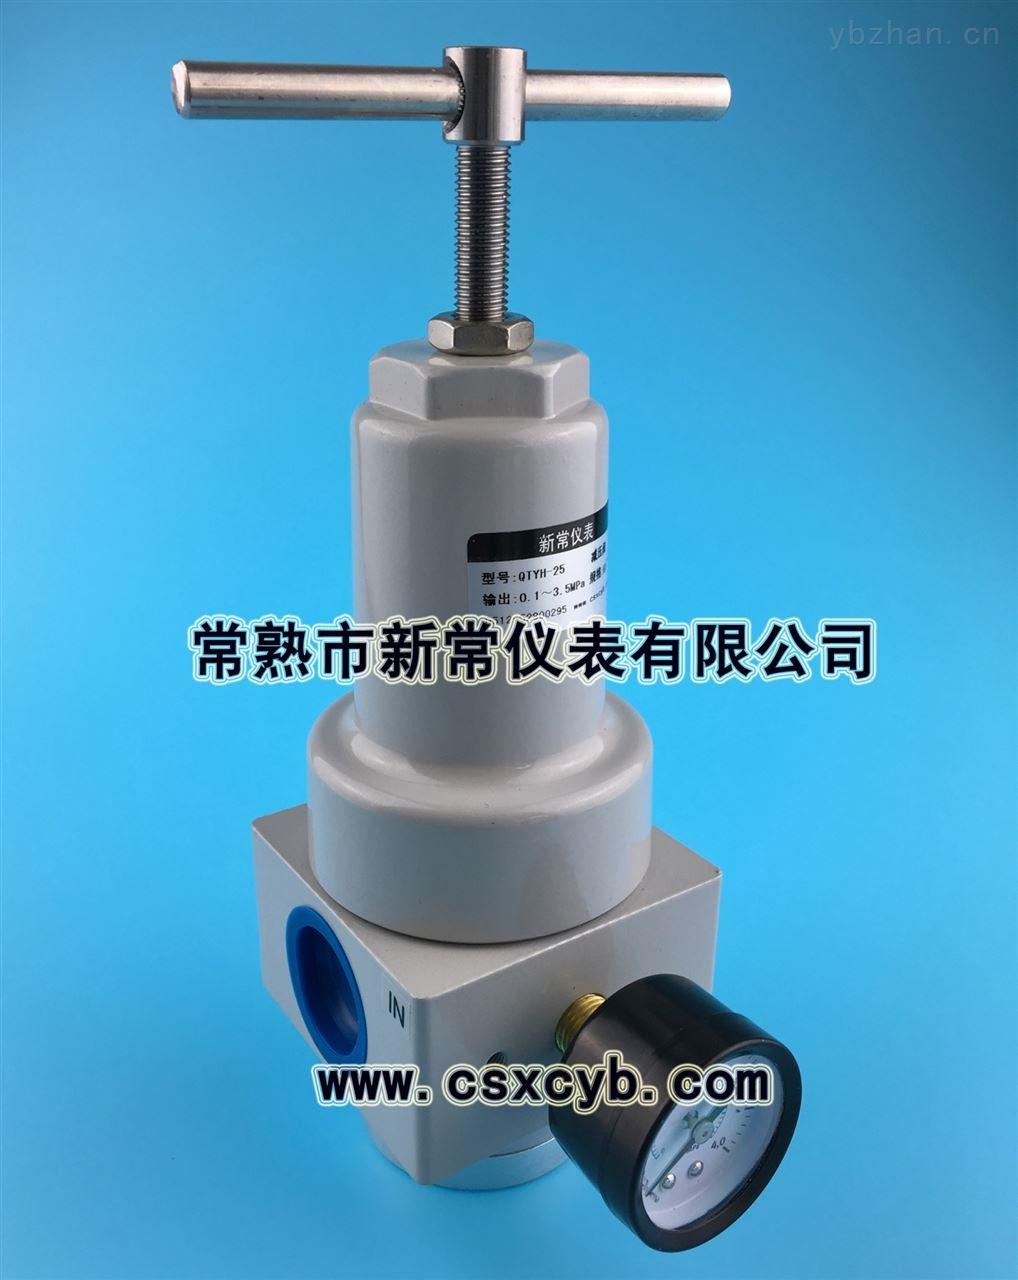 QTYH-08高压减压器